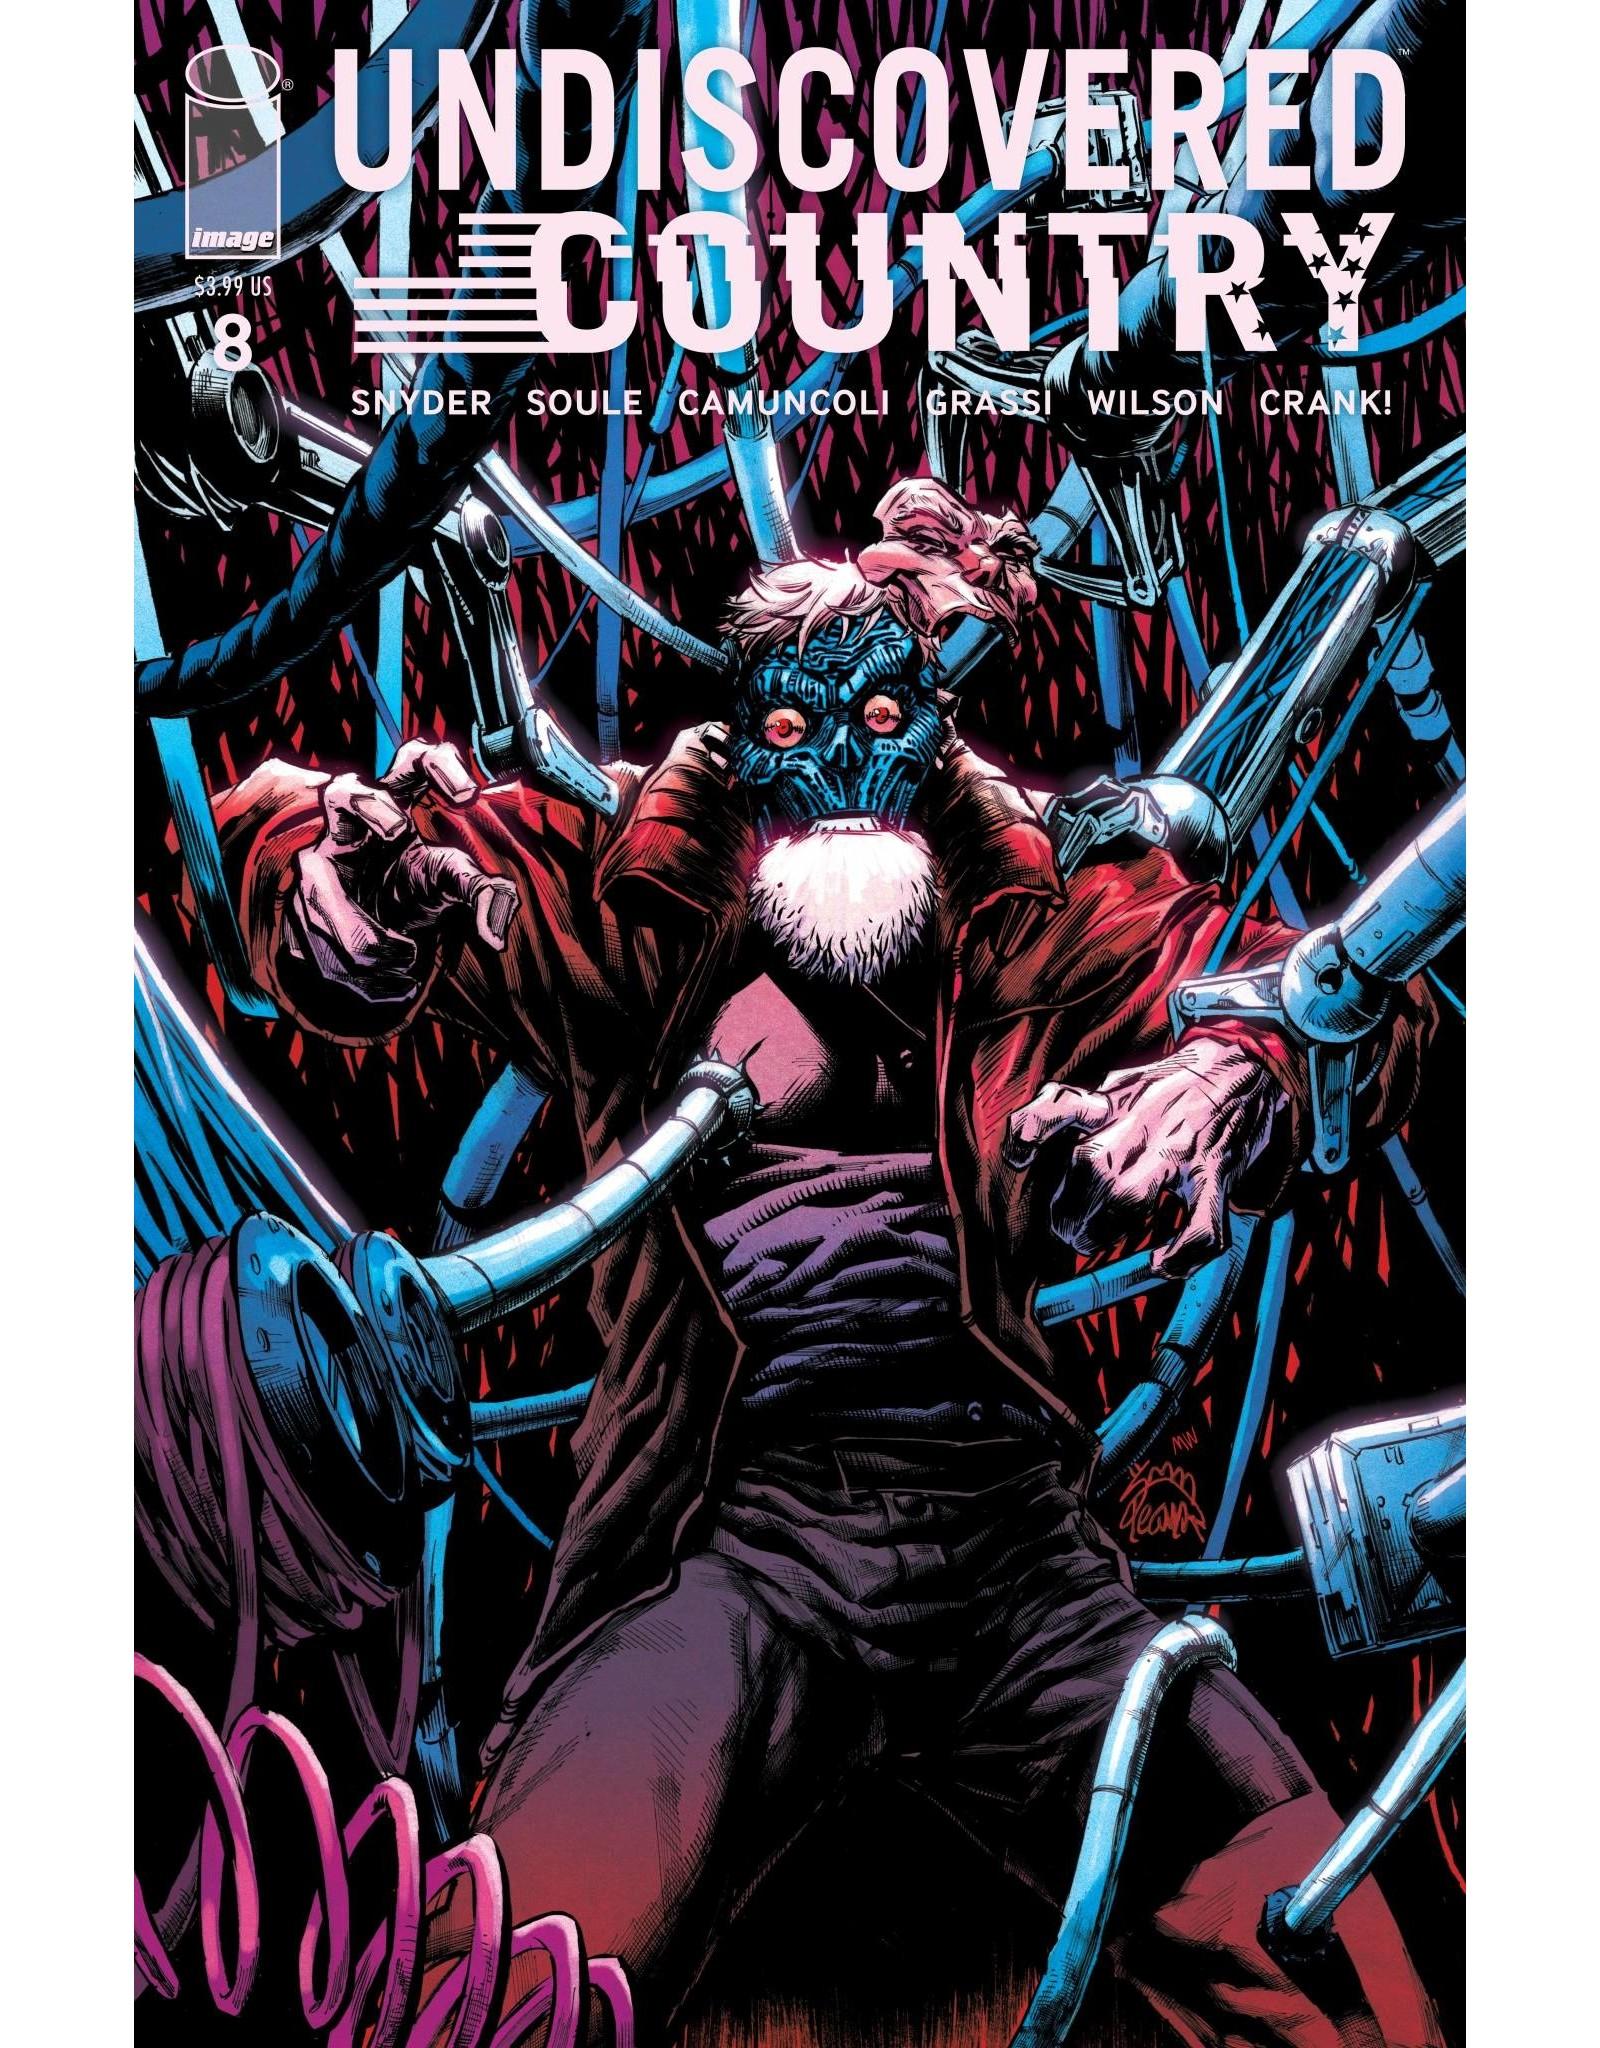 Image Comics UNDISCOVERED COUNTRY #8 CVR B STEGMAN (MR)